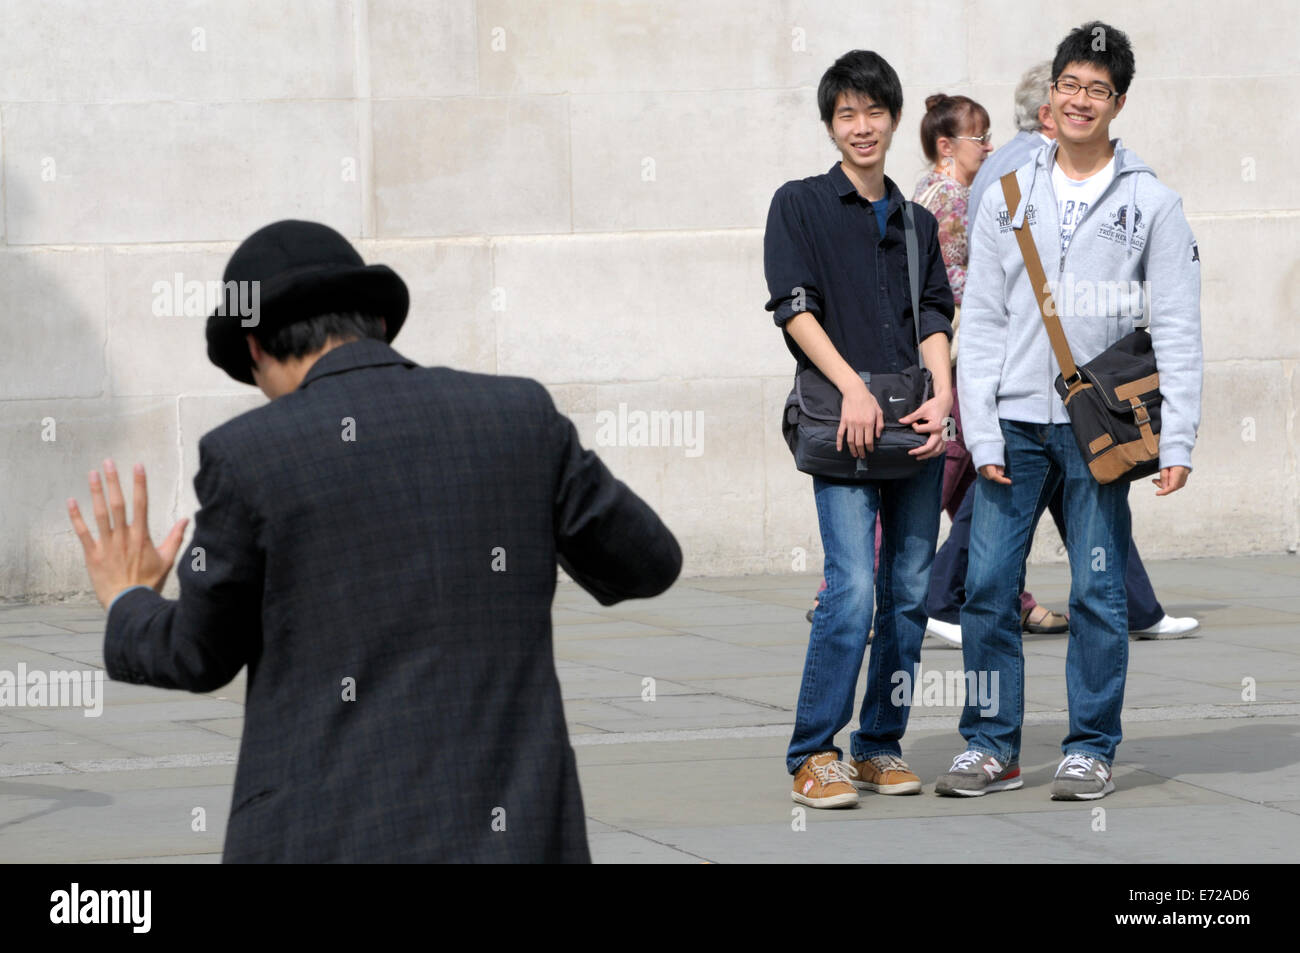 London, England, UK. Tourists watching a mime artist in Trafalgar Square Stock Photo